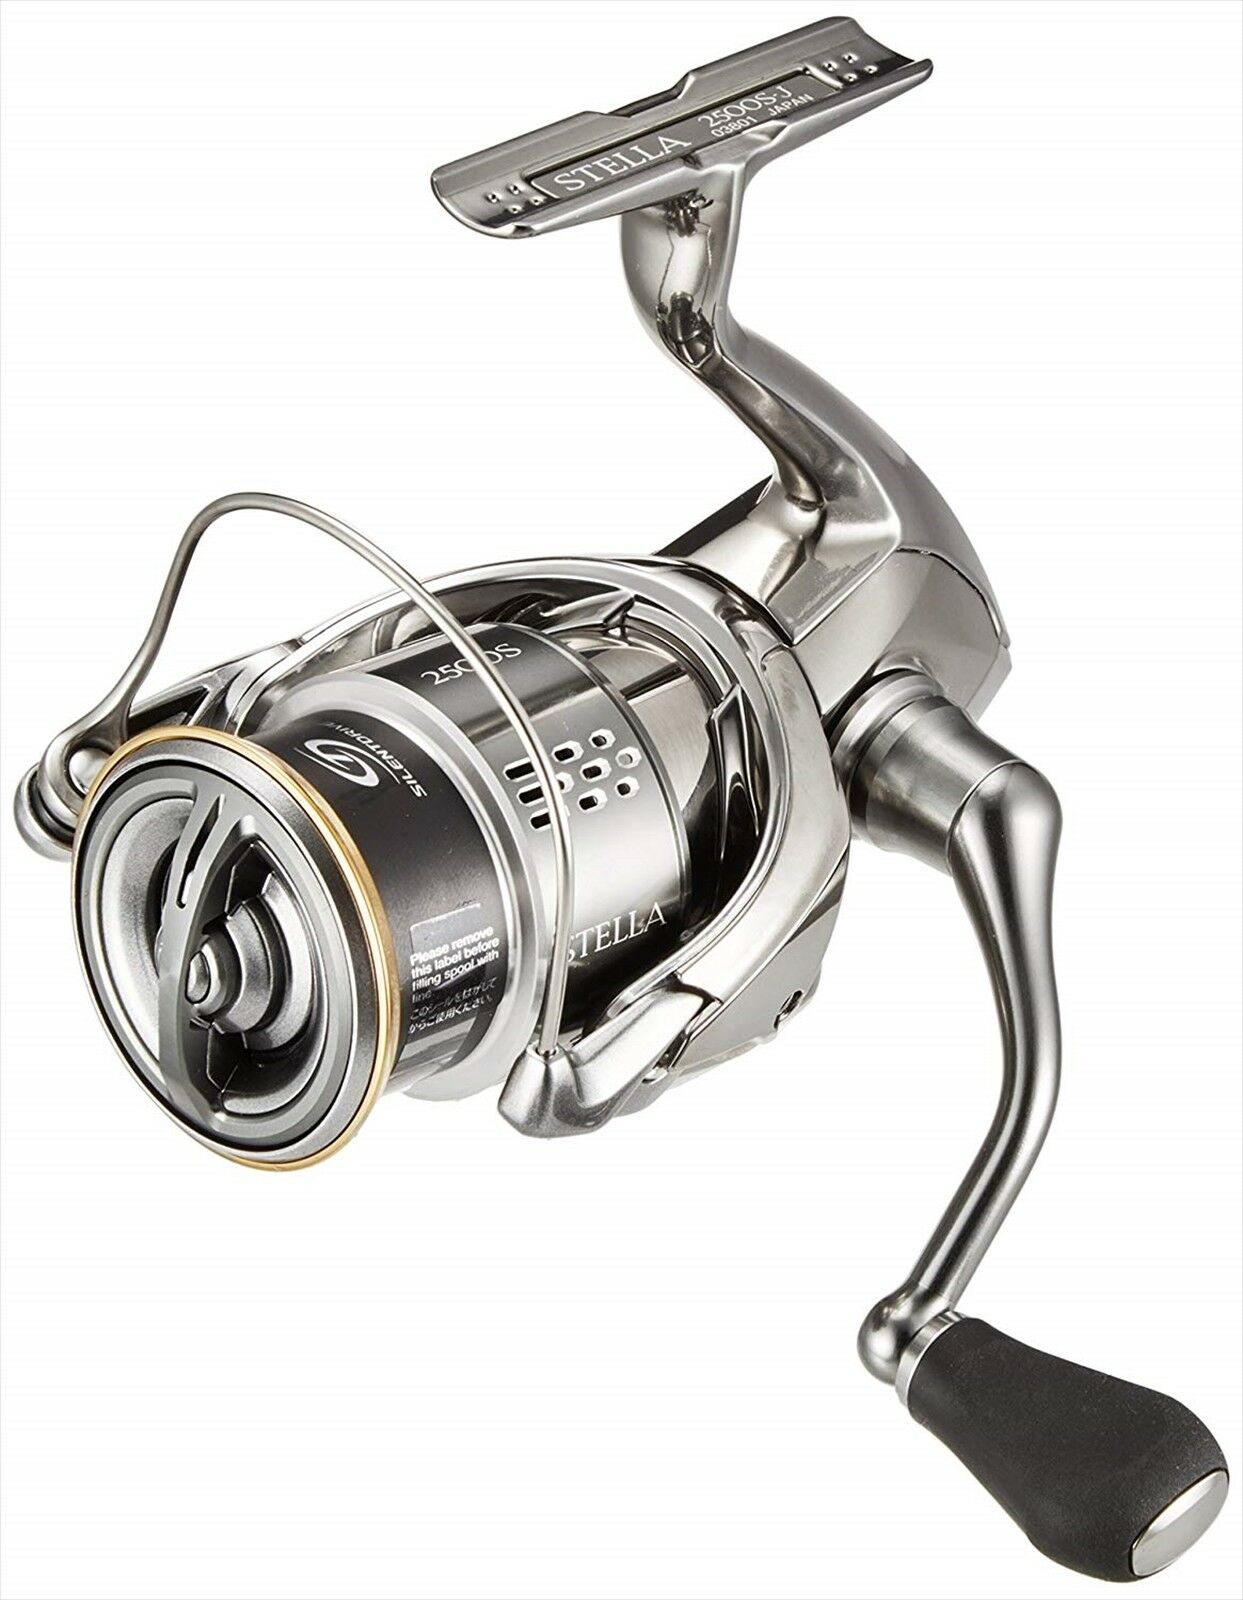 Shimano reel spinning reel  18 Stella 2500S Fishing Goods genuine from JAPAN NEW  10 days return